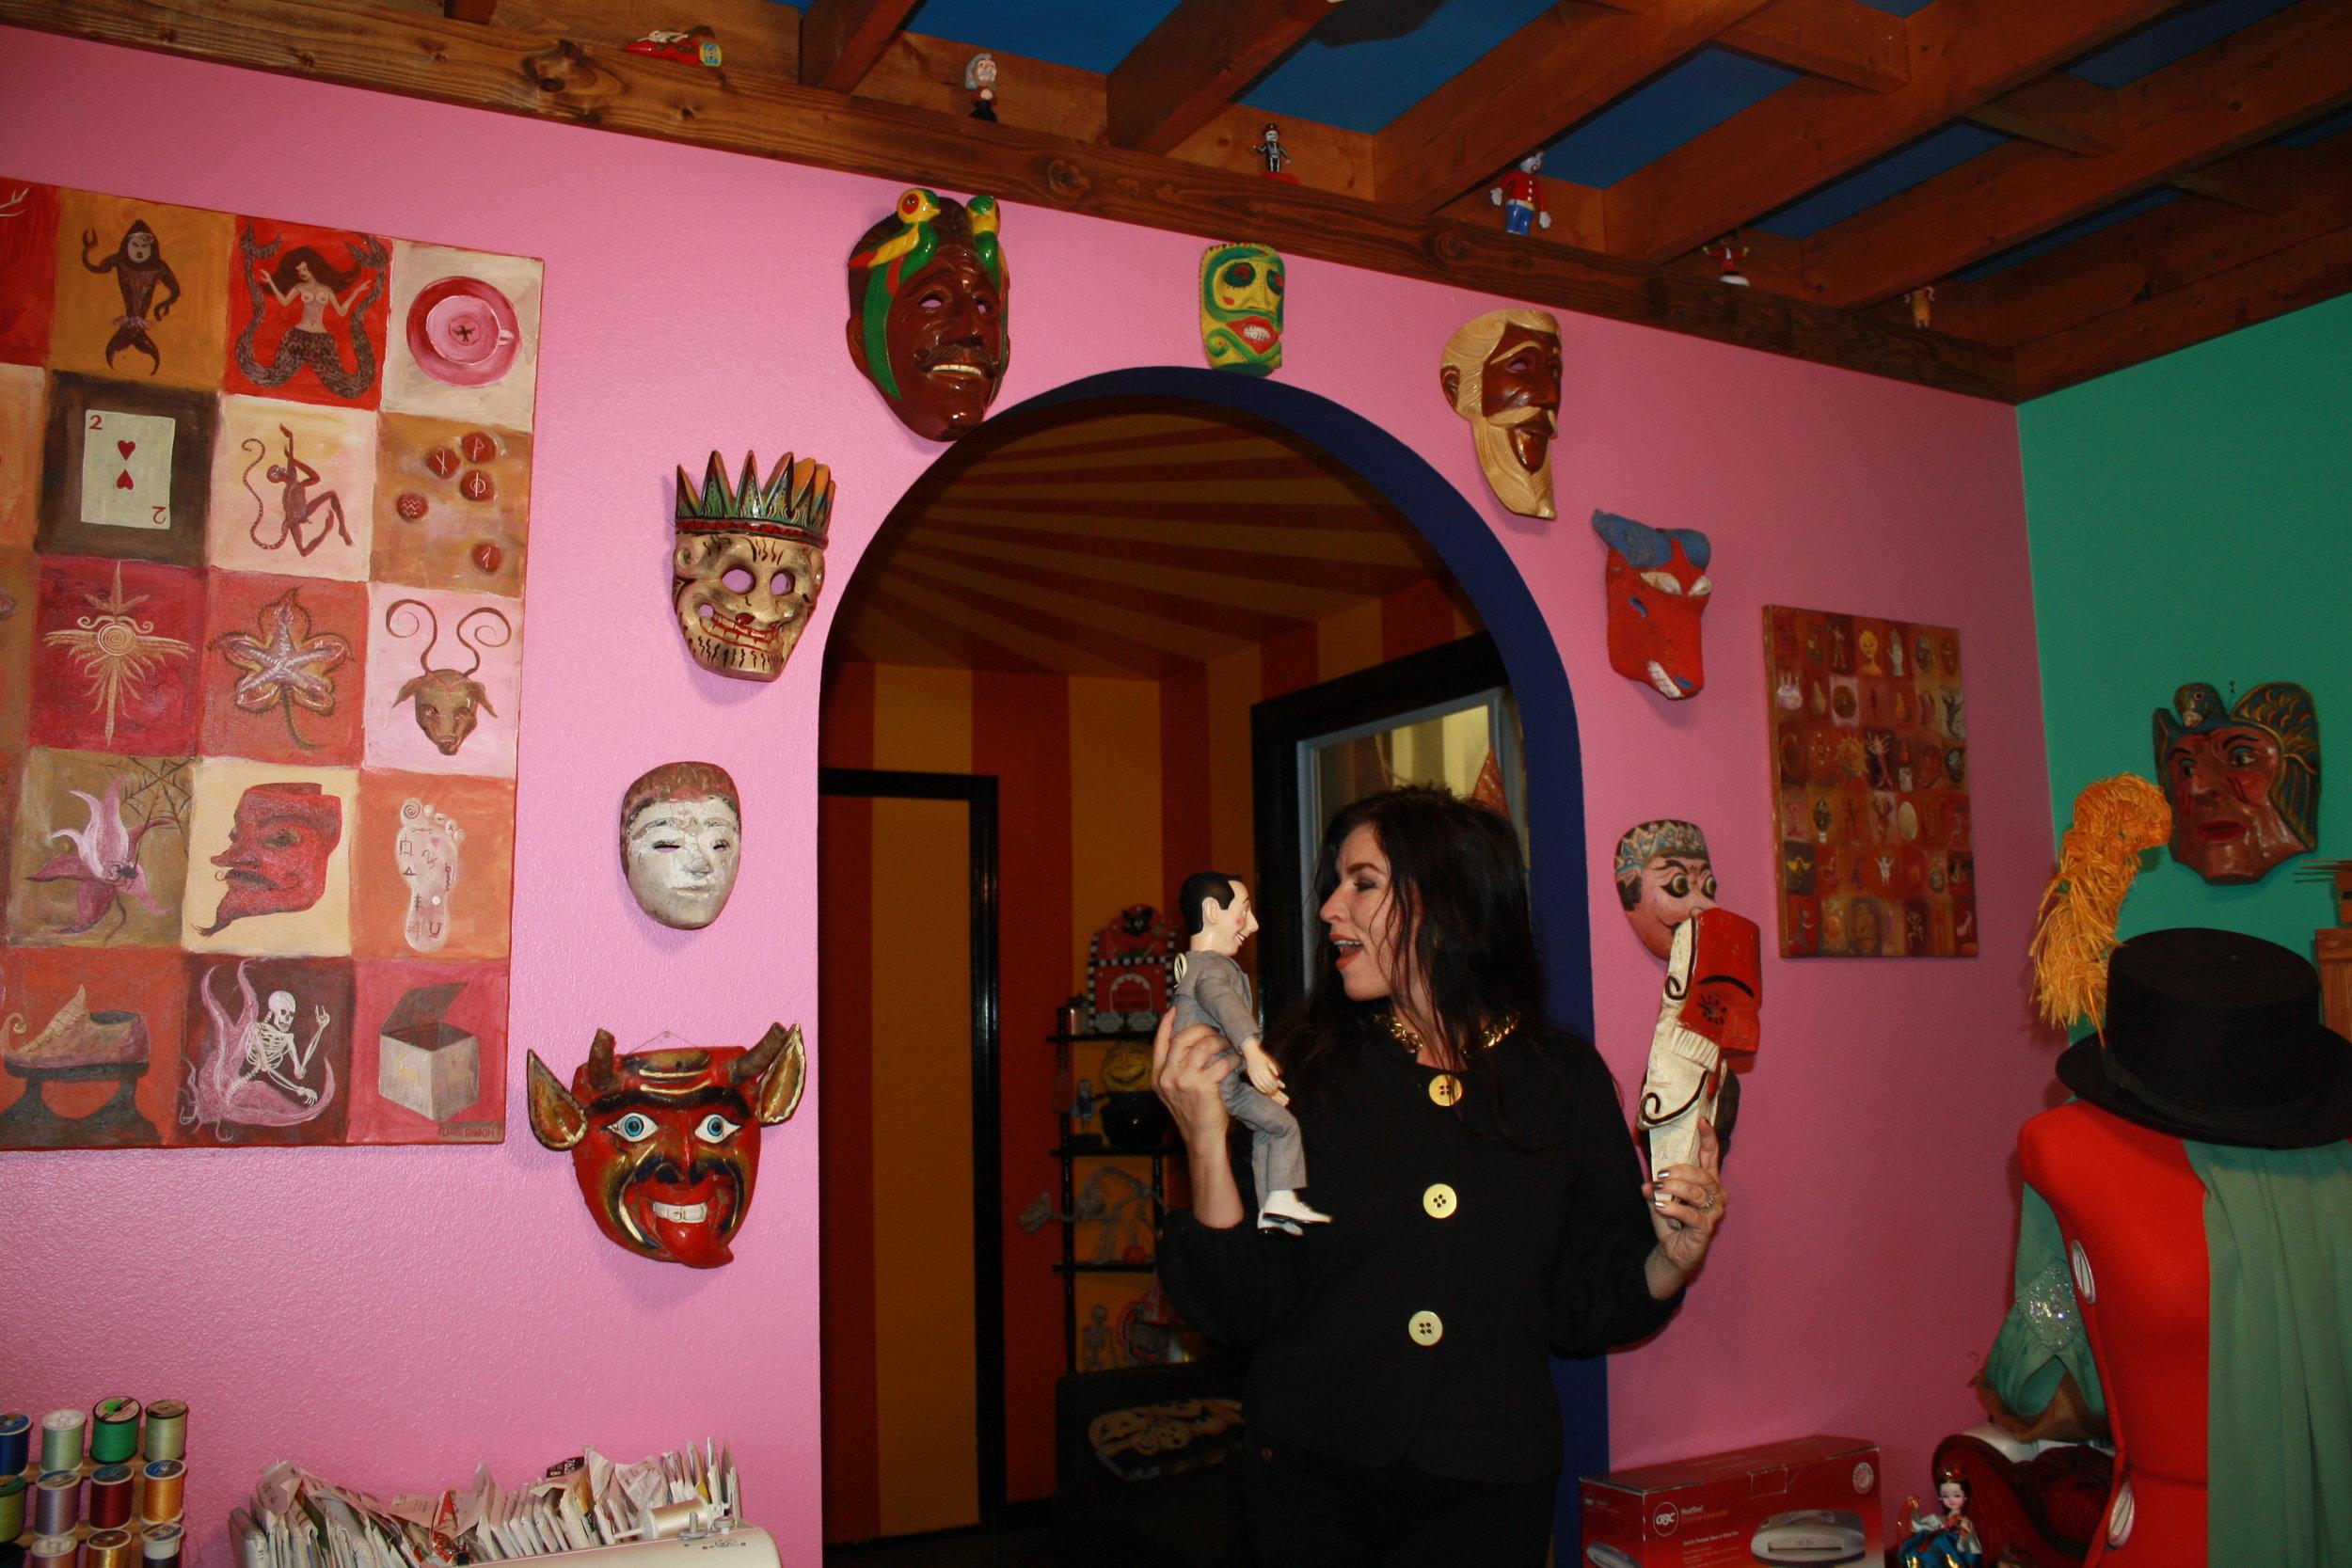 The Fiesta Room